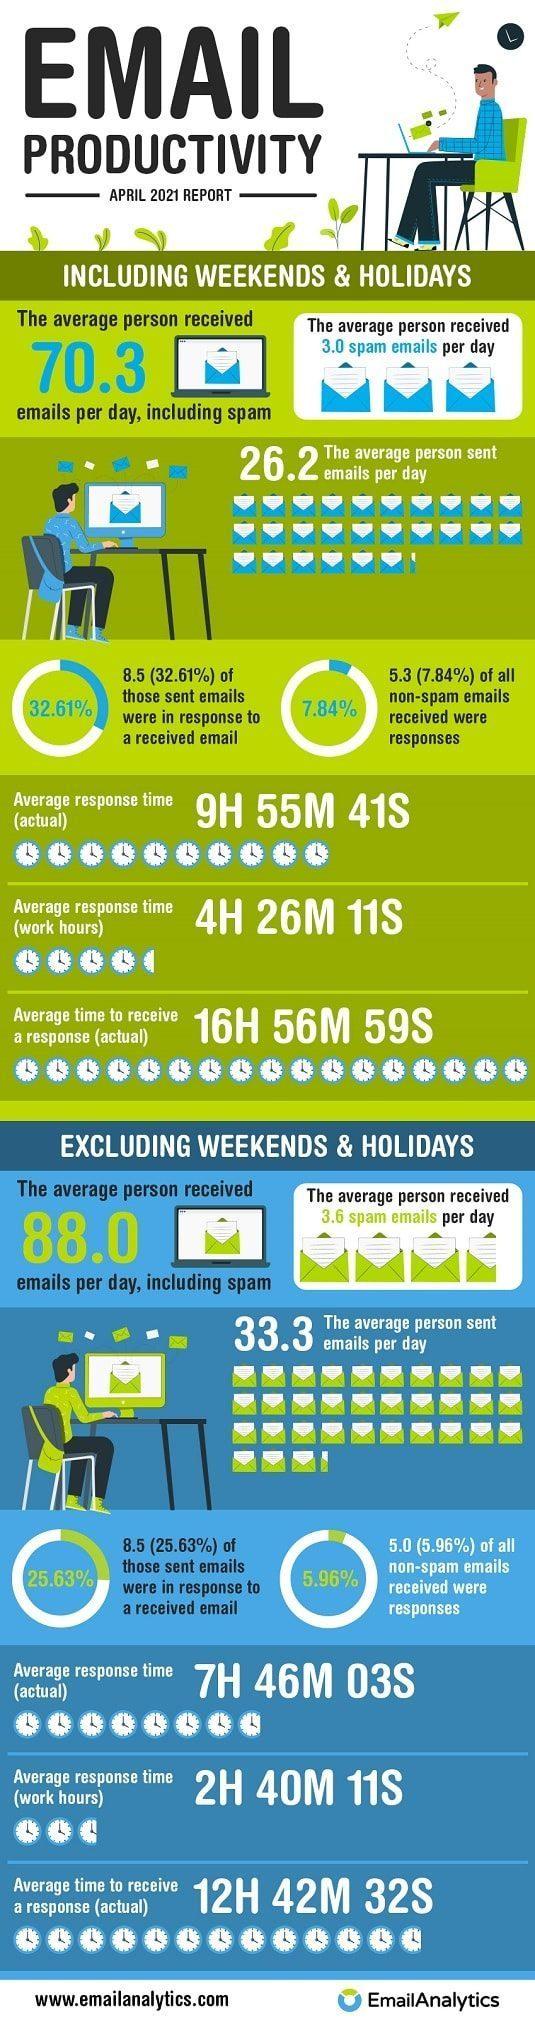 Email Productivity Report April